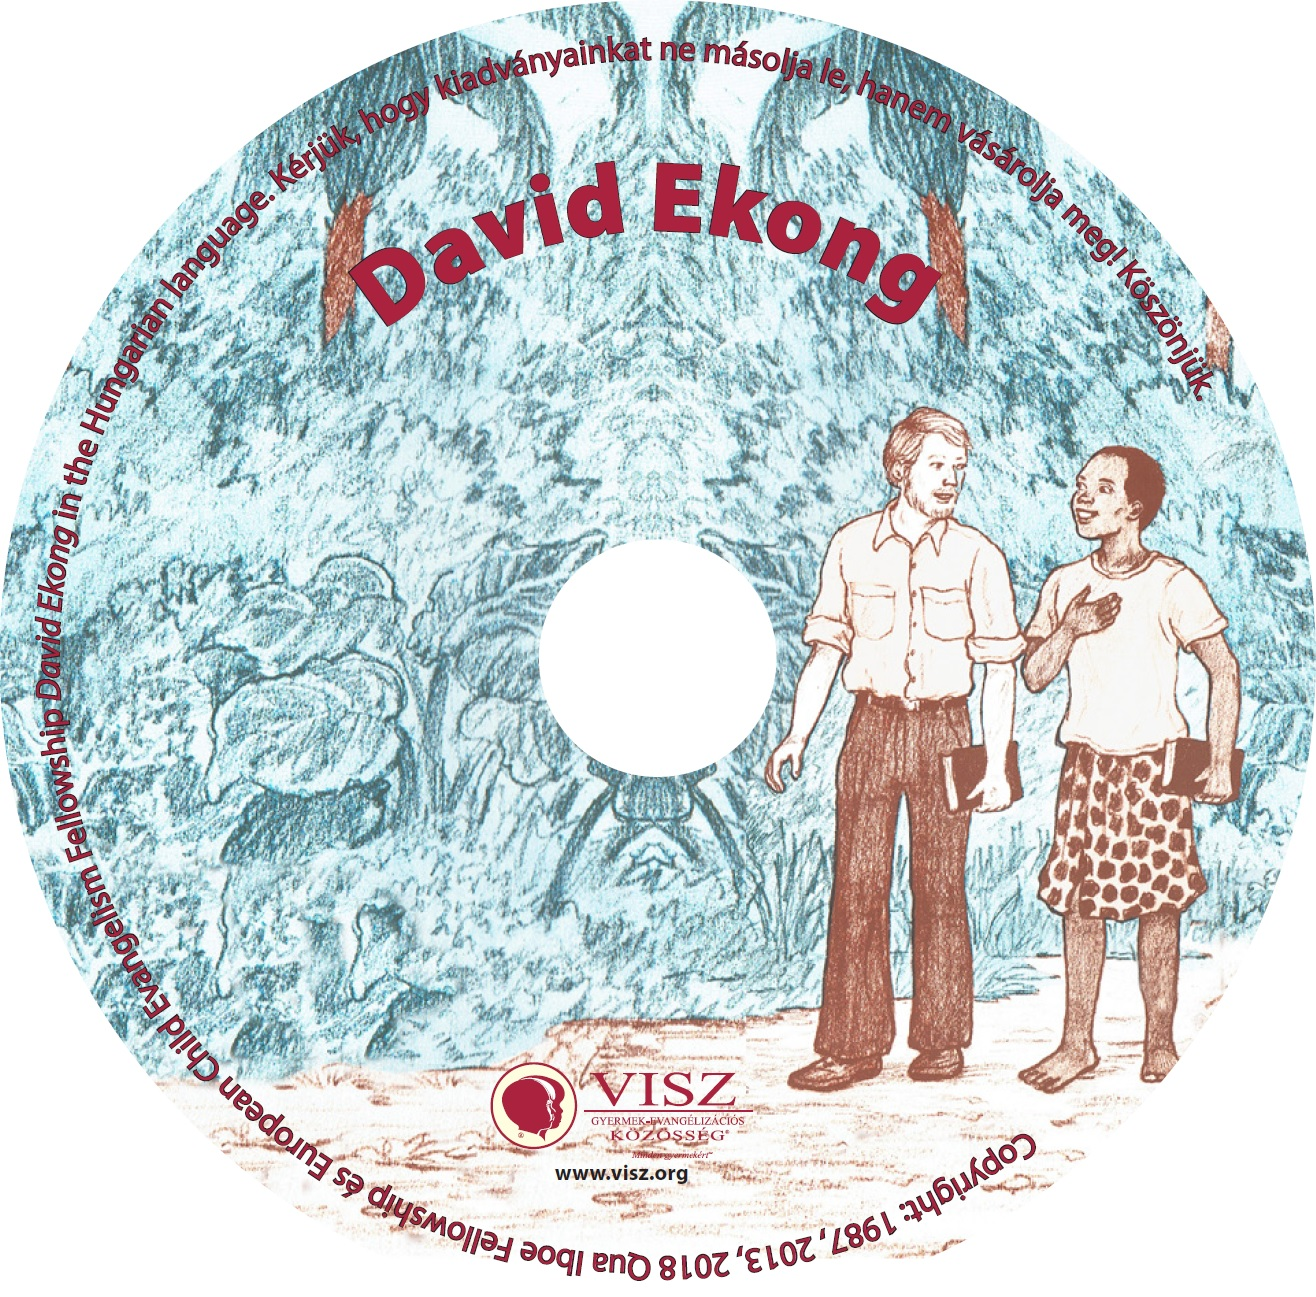 David Ekong CD